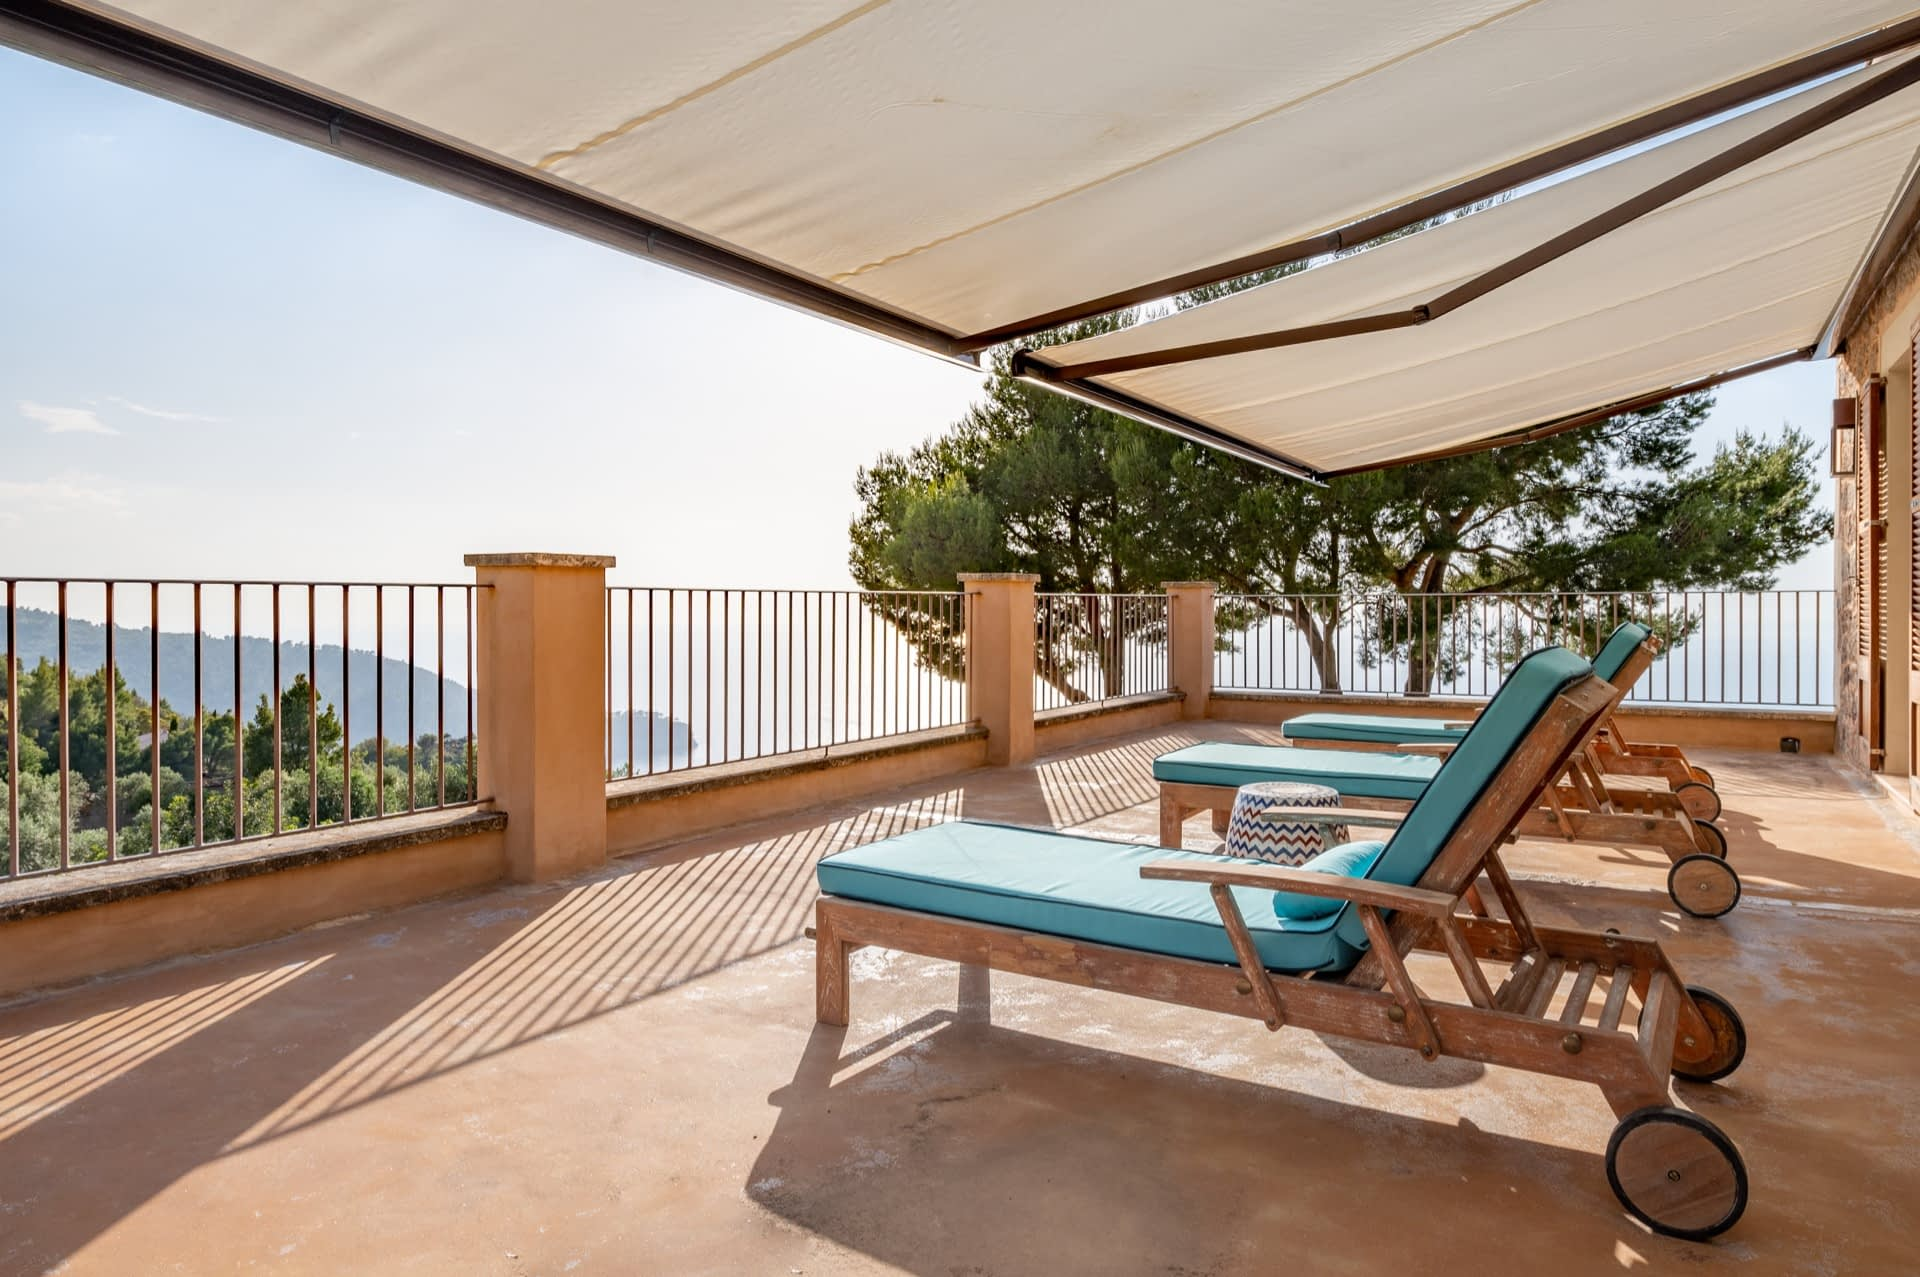 Lovely Design Villa in Tramuntana Mountains near Deia in Mallorca